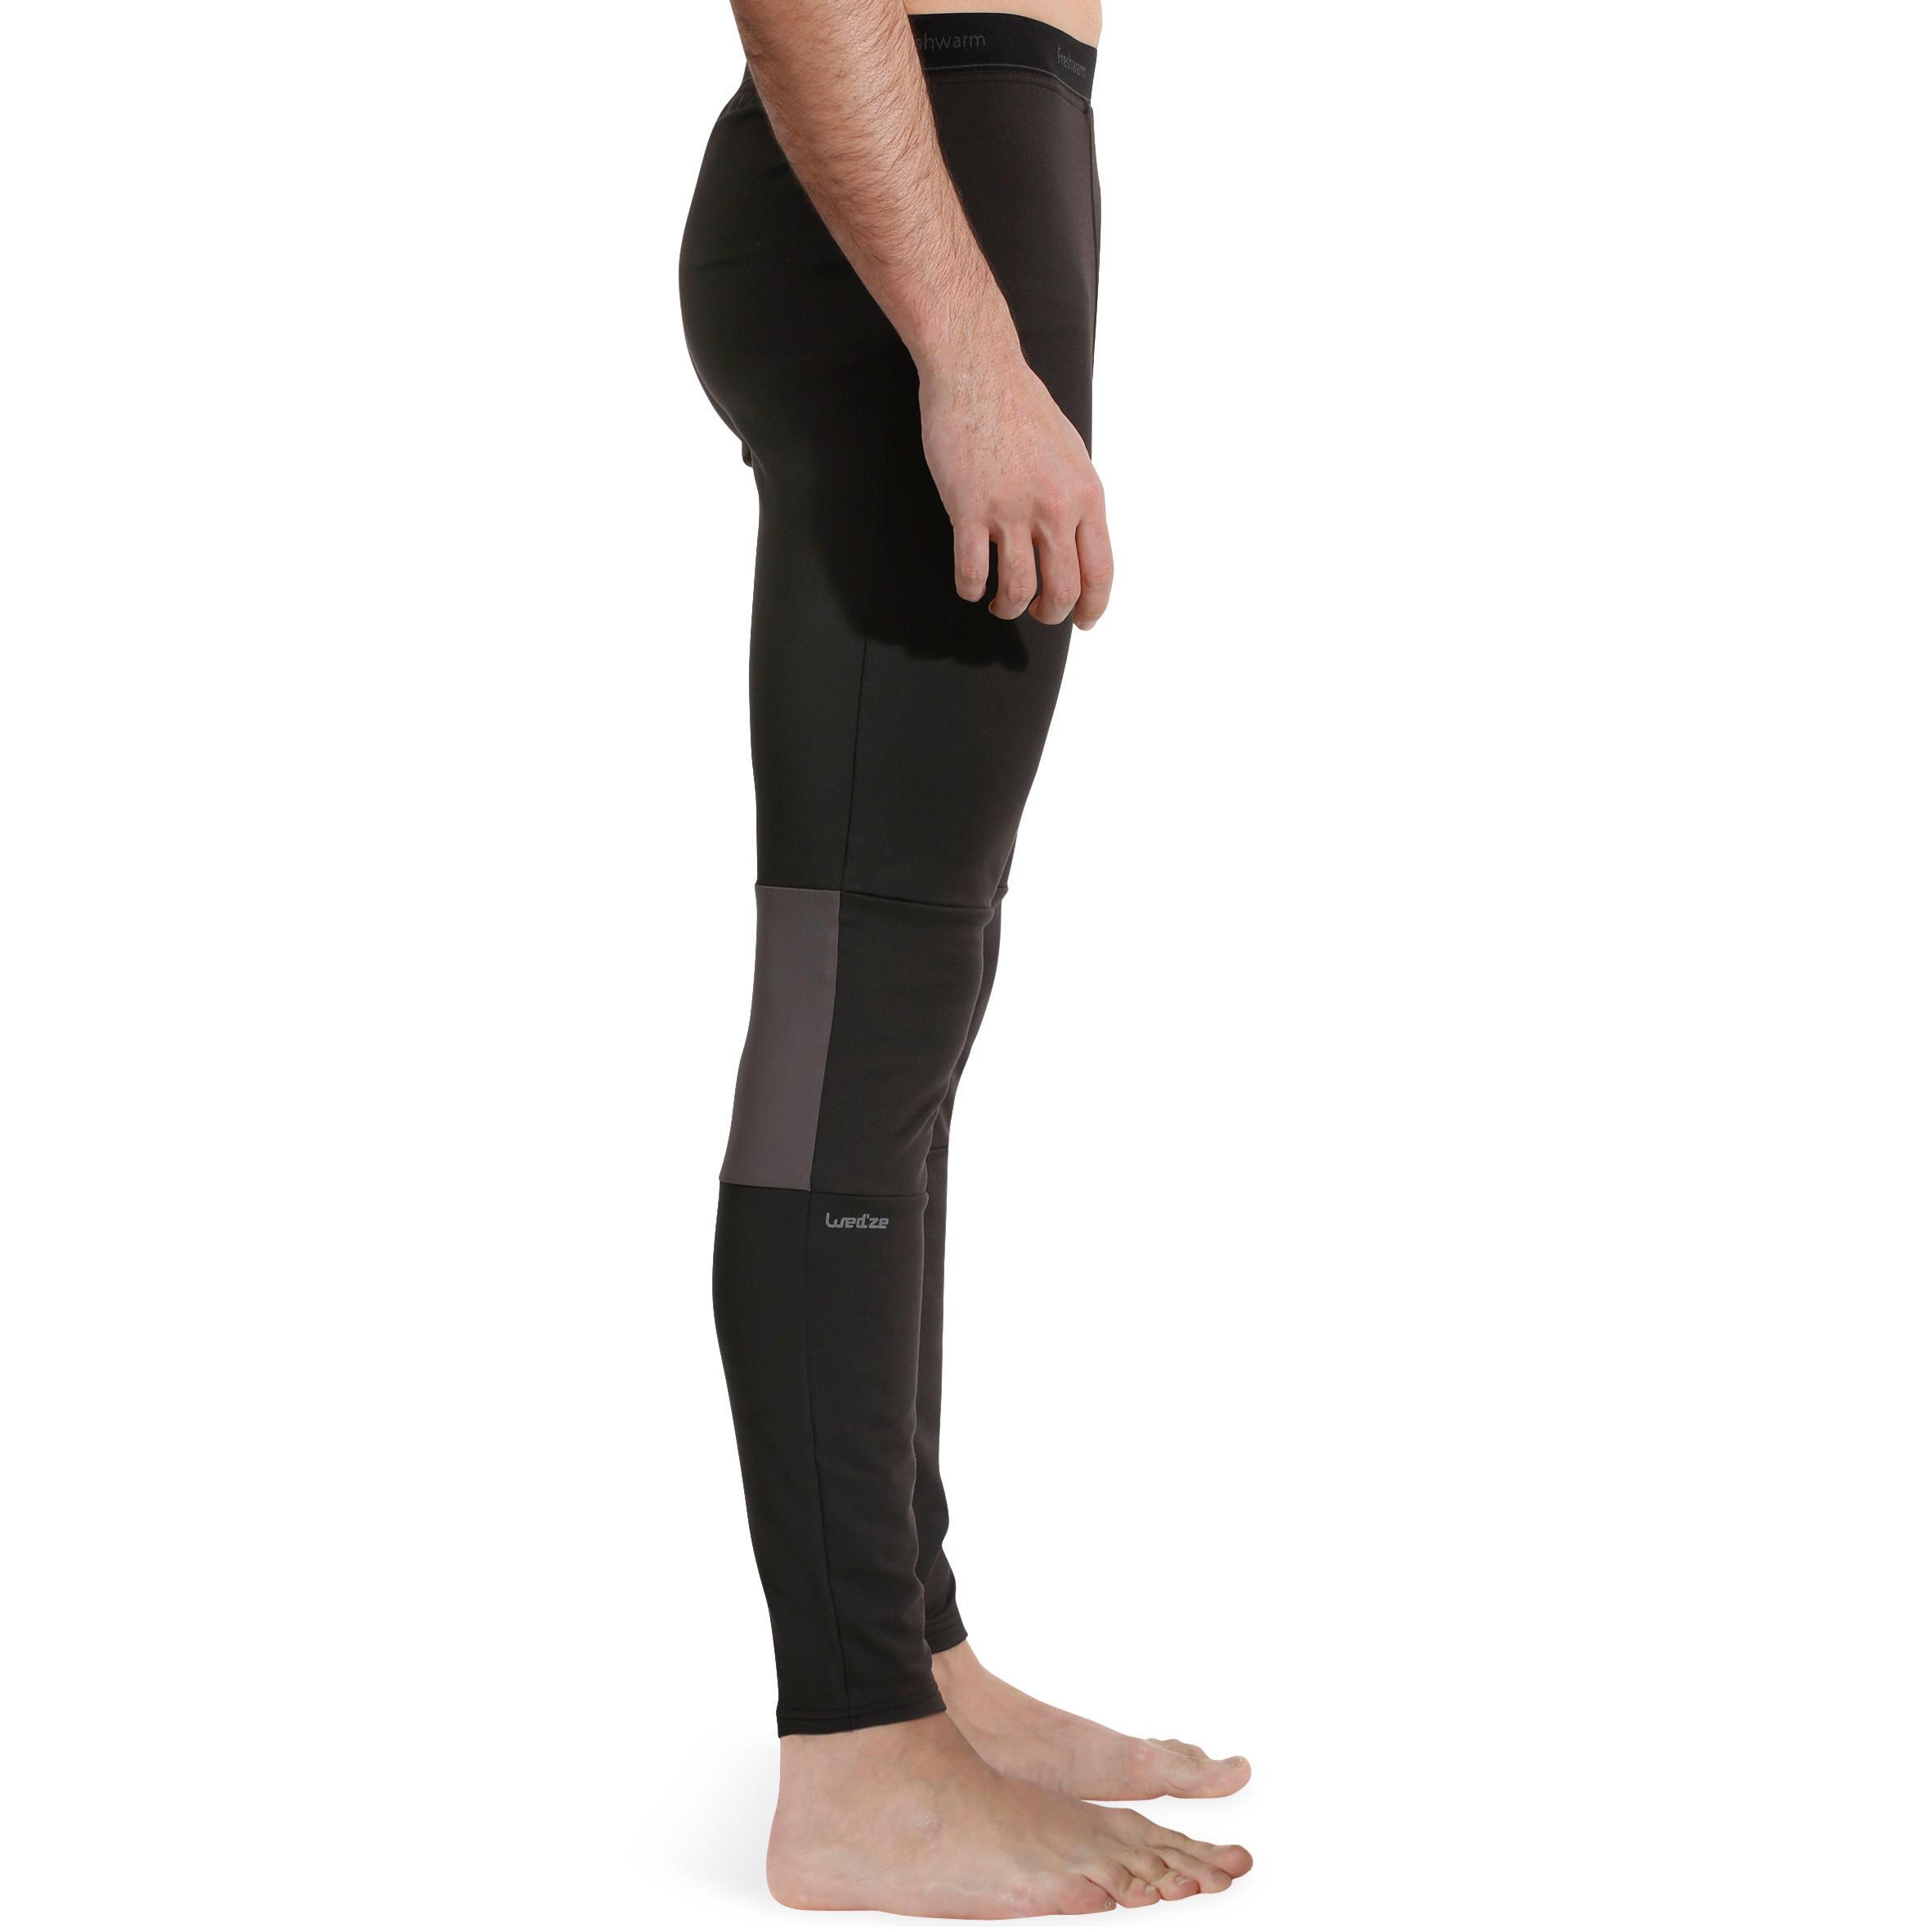 Freshwarm Men's Ski Underwear Bottoms - Black